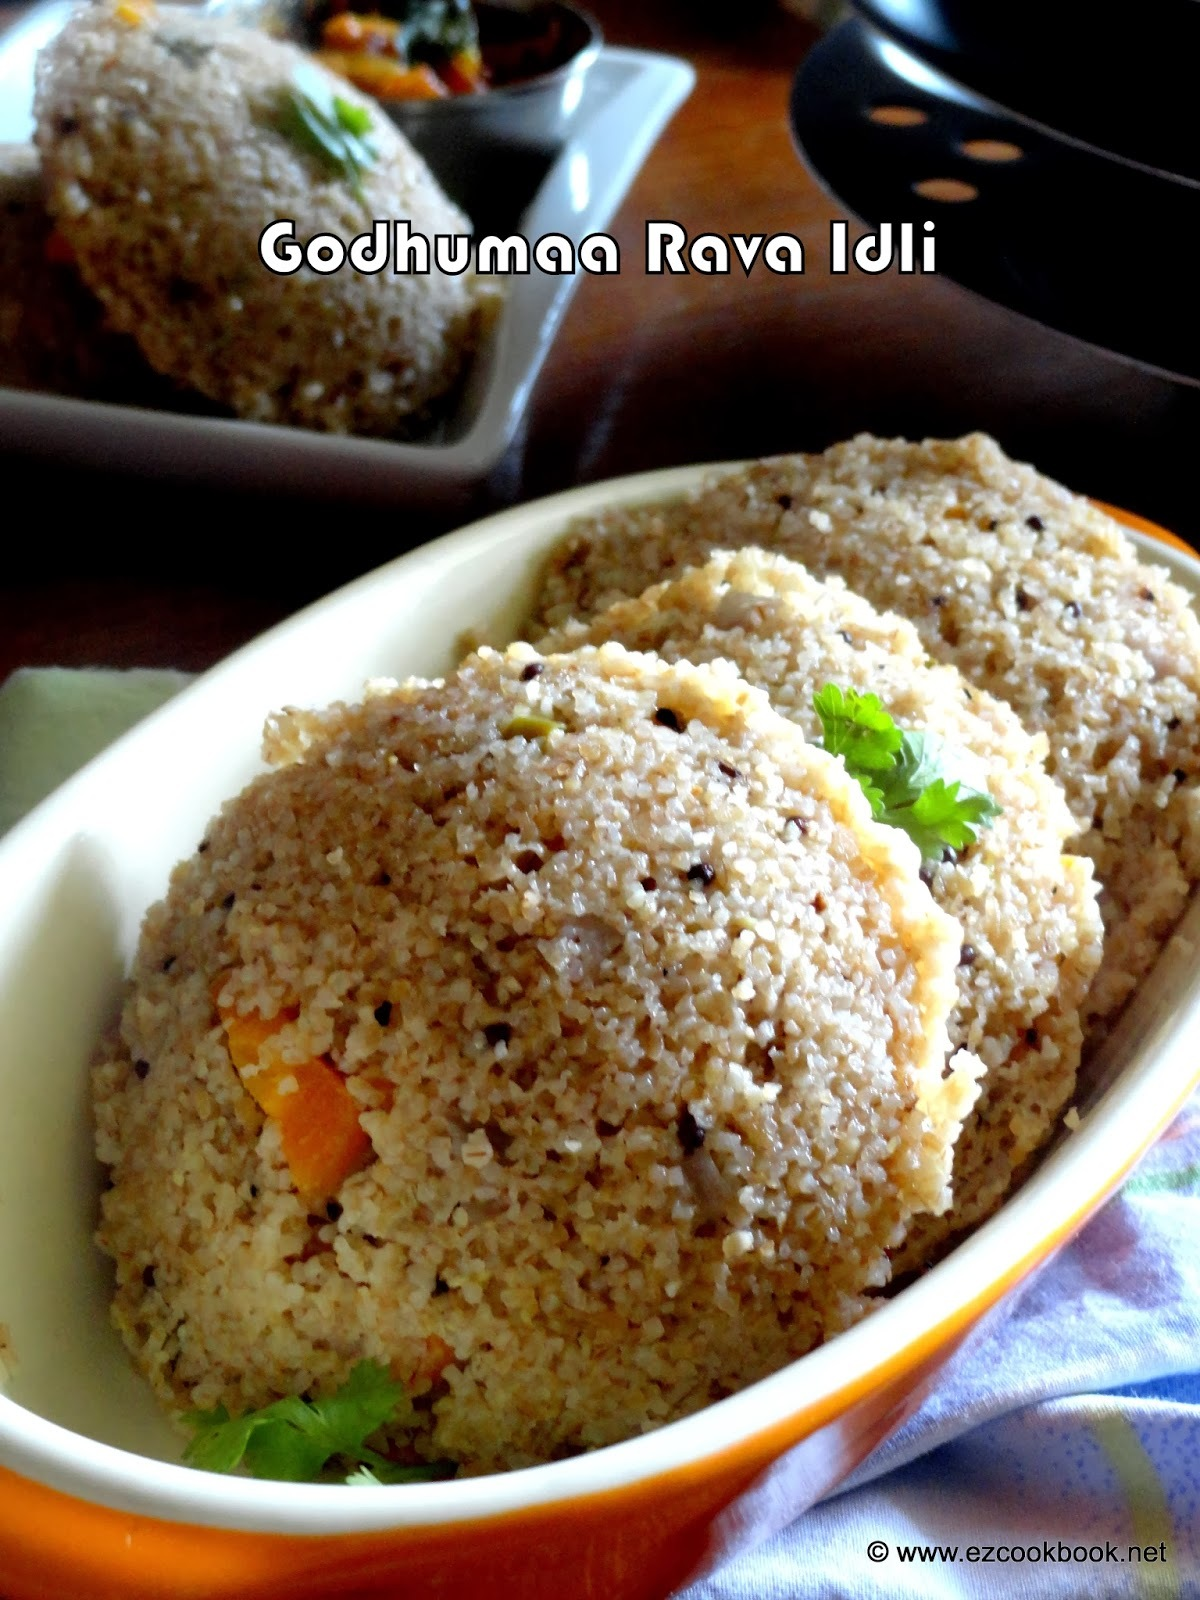 Broken Wheat Rava Idli | Godhuma Rava Idli - Instant Idli Recipe